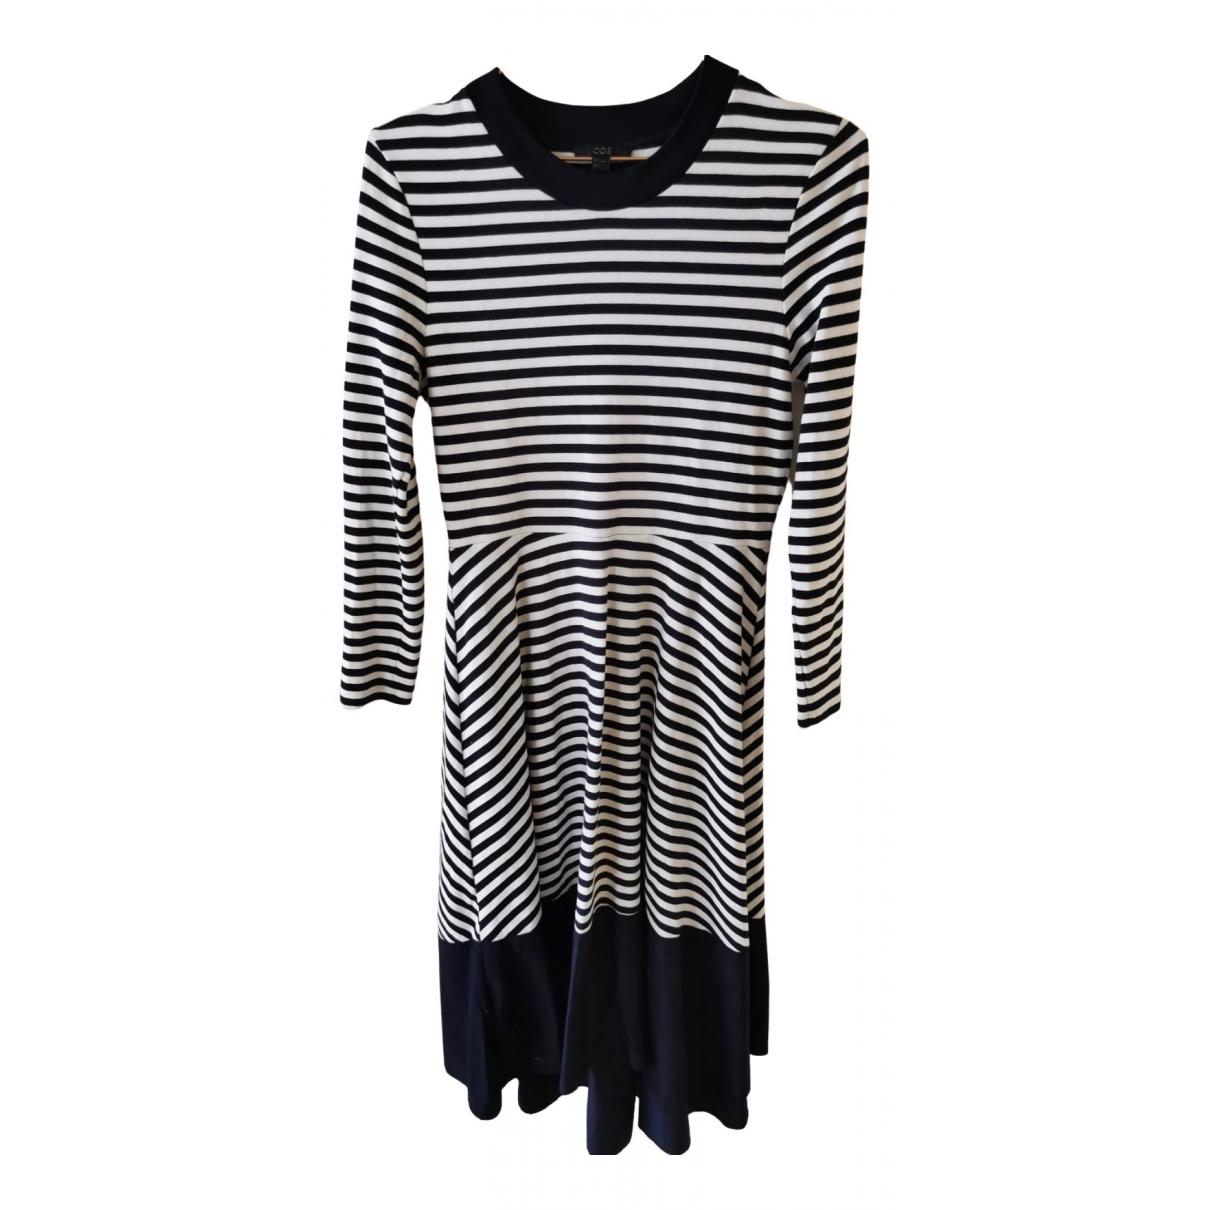 Cos \N Blue Cotton dress for Women XS International